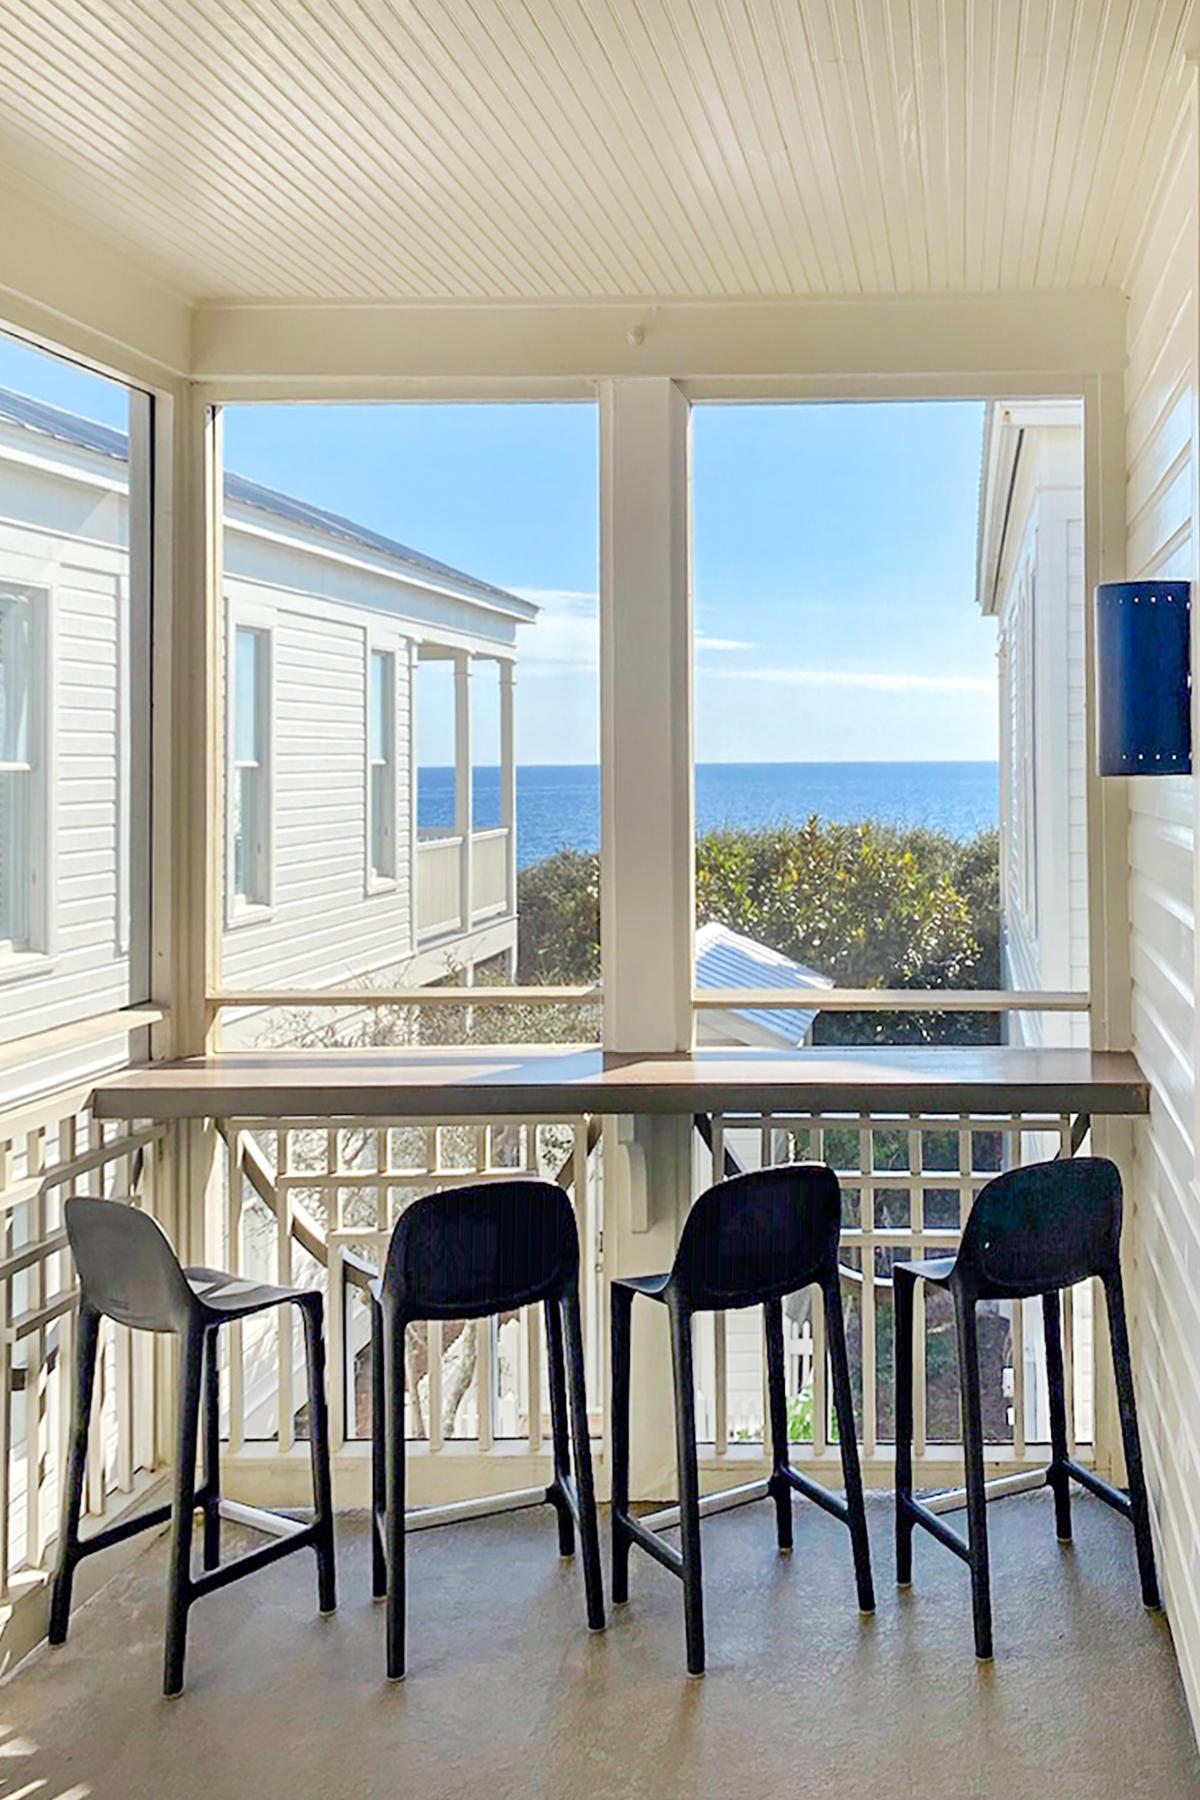 2nd floor porch views